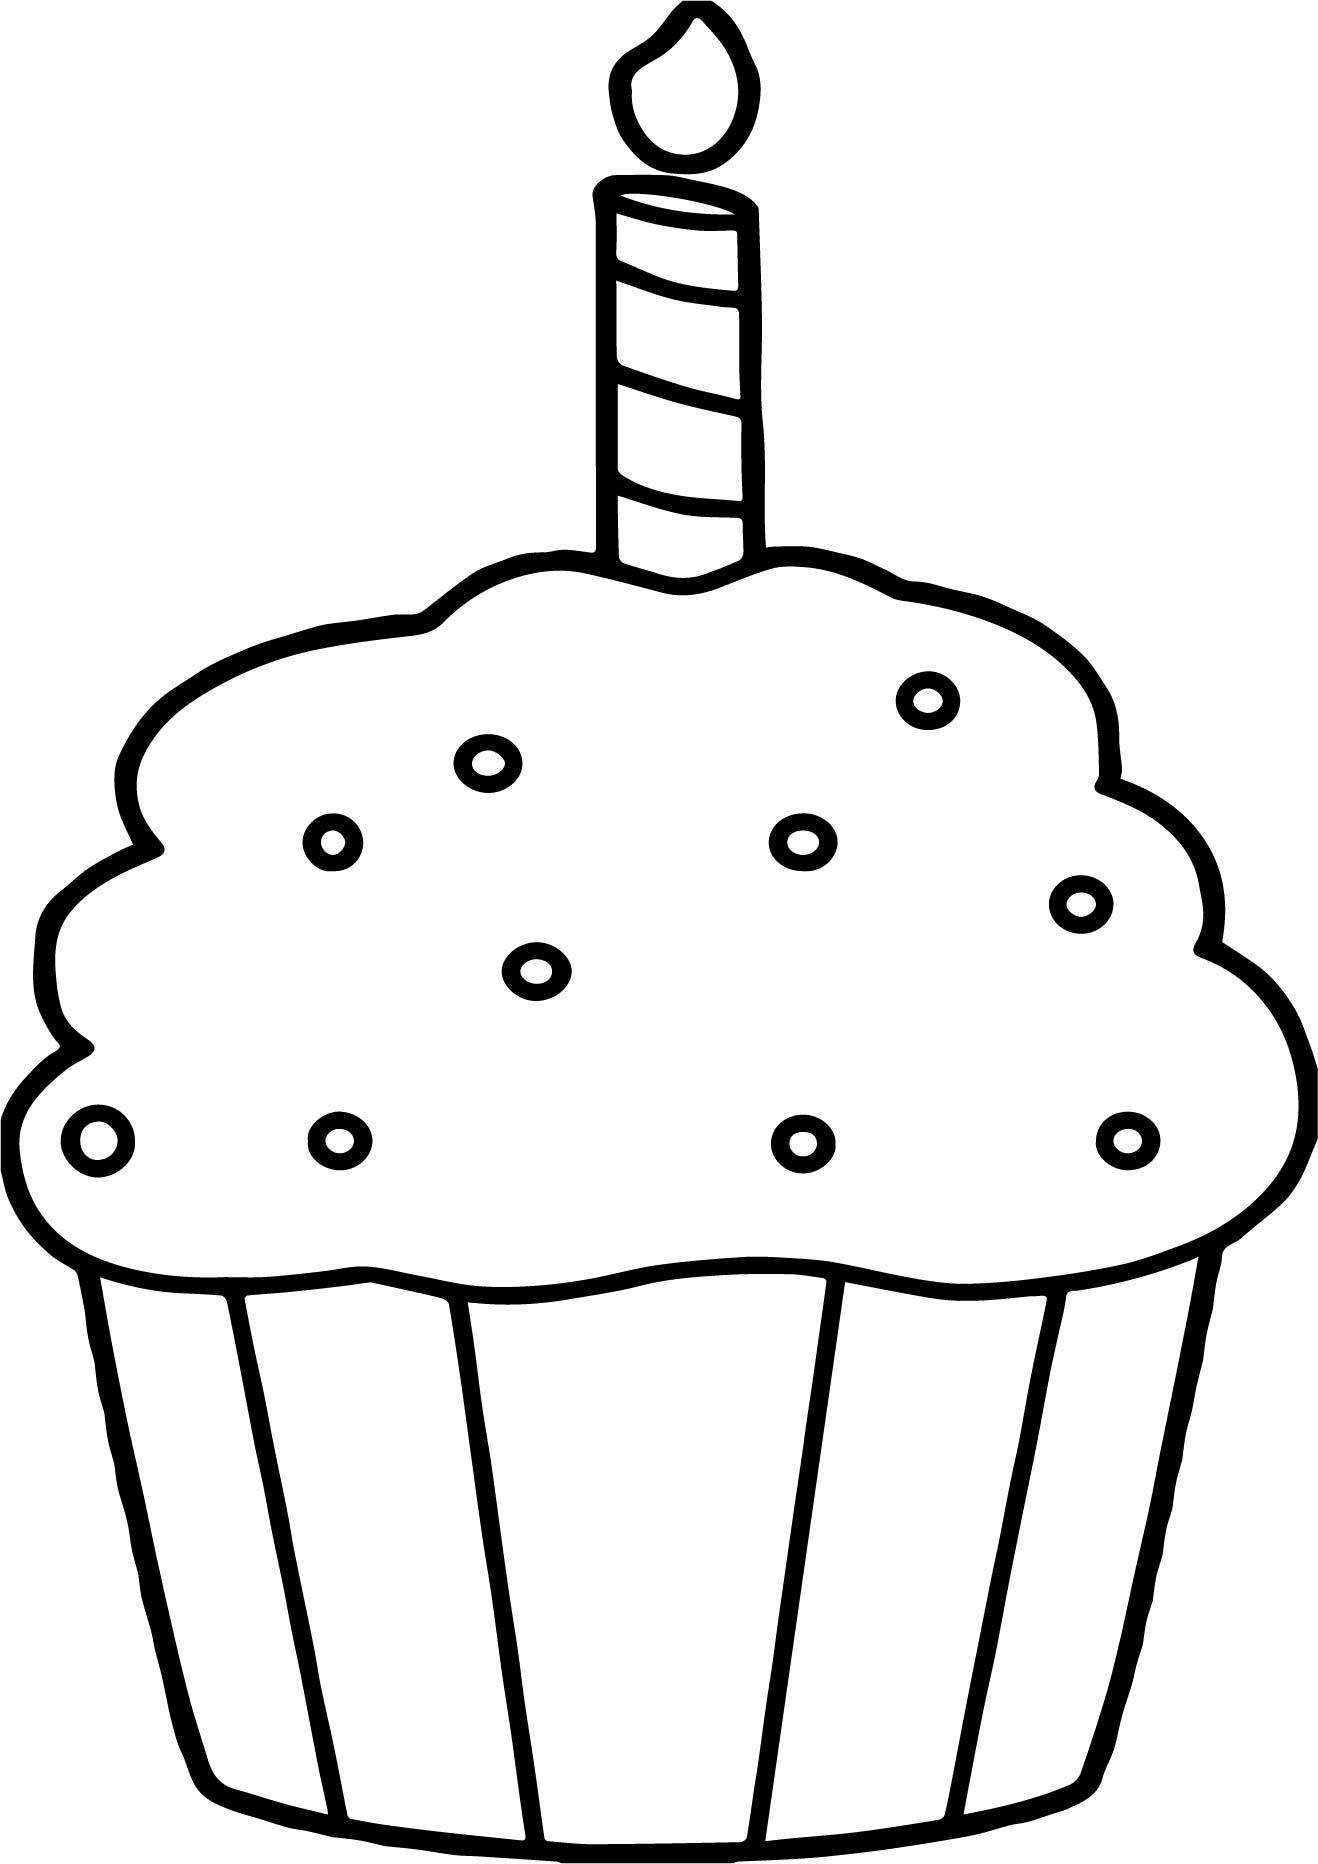 38 Coloring Page Cupcake Cupcake Coloring Pages Happy Birthday Coloring Pages Birthday Coloring Pages